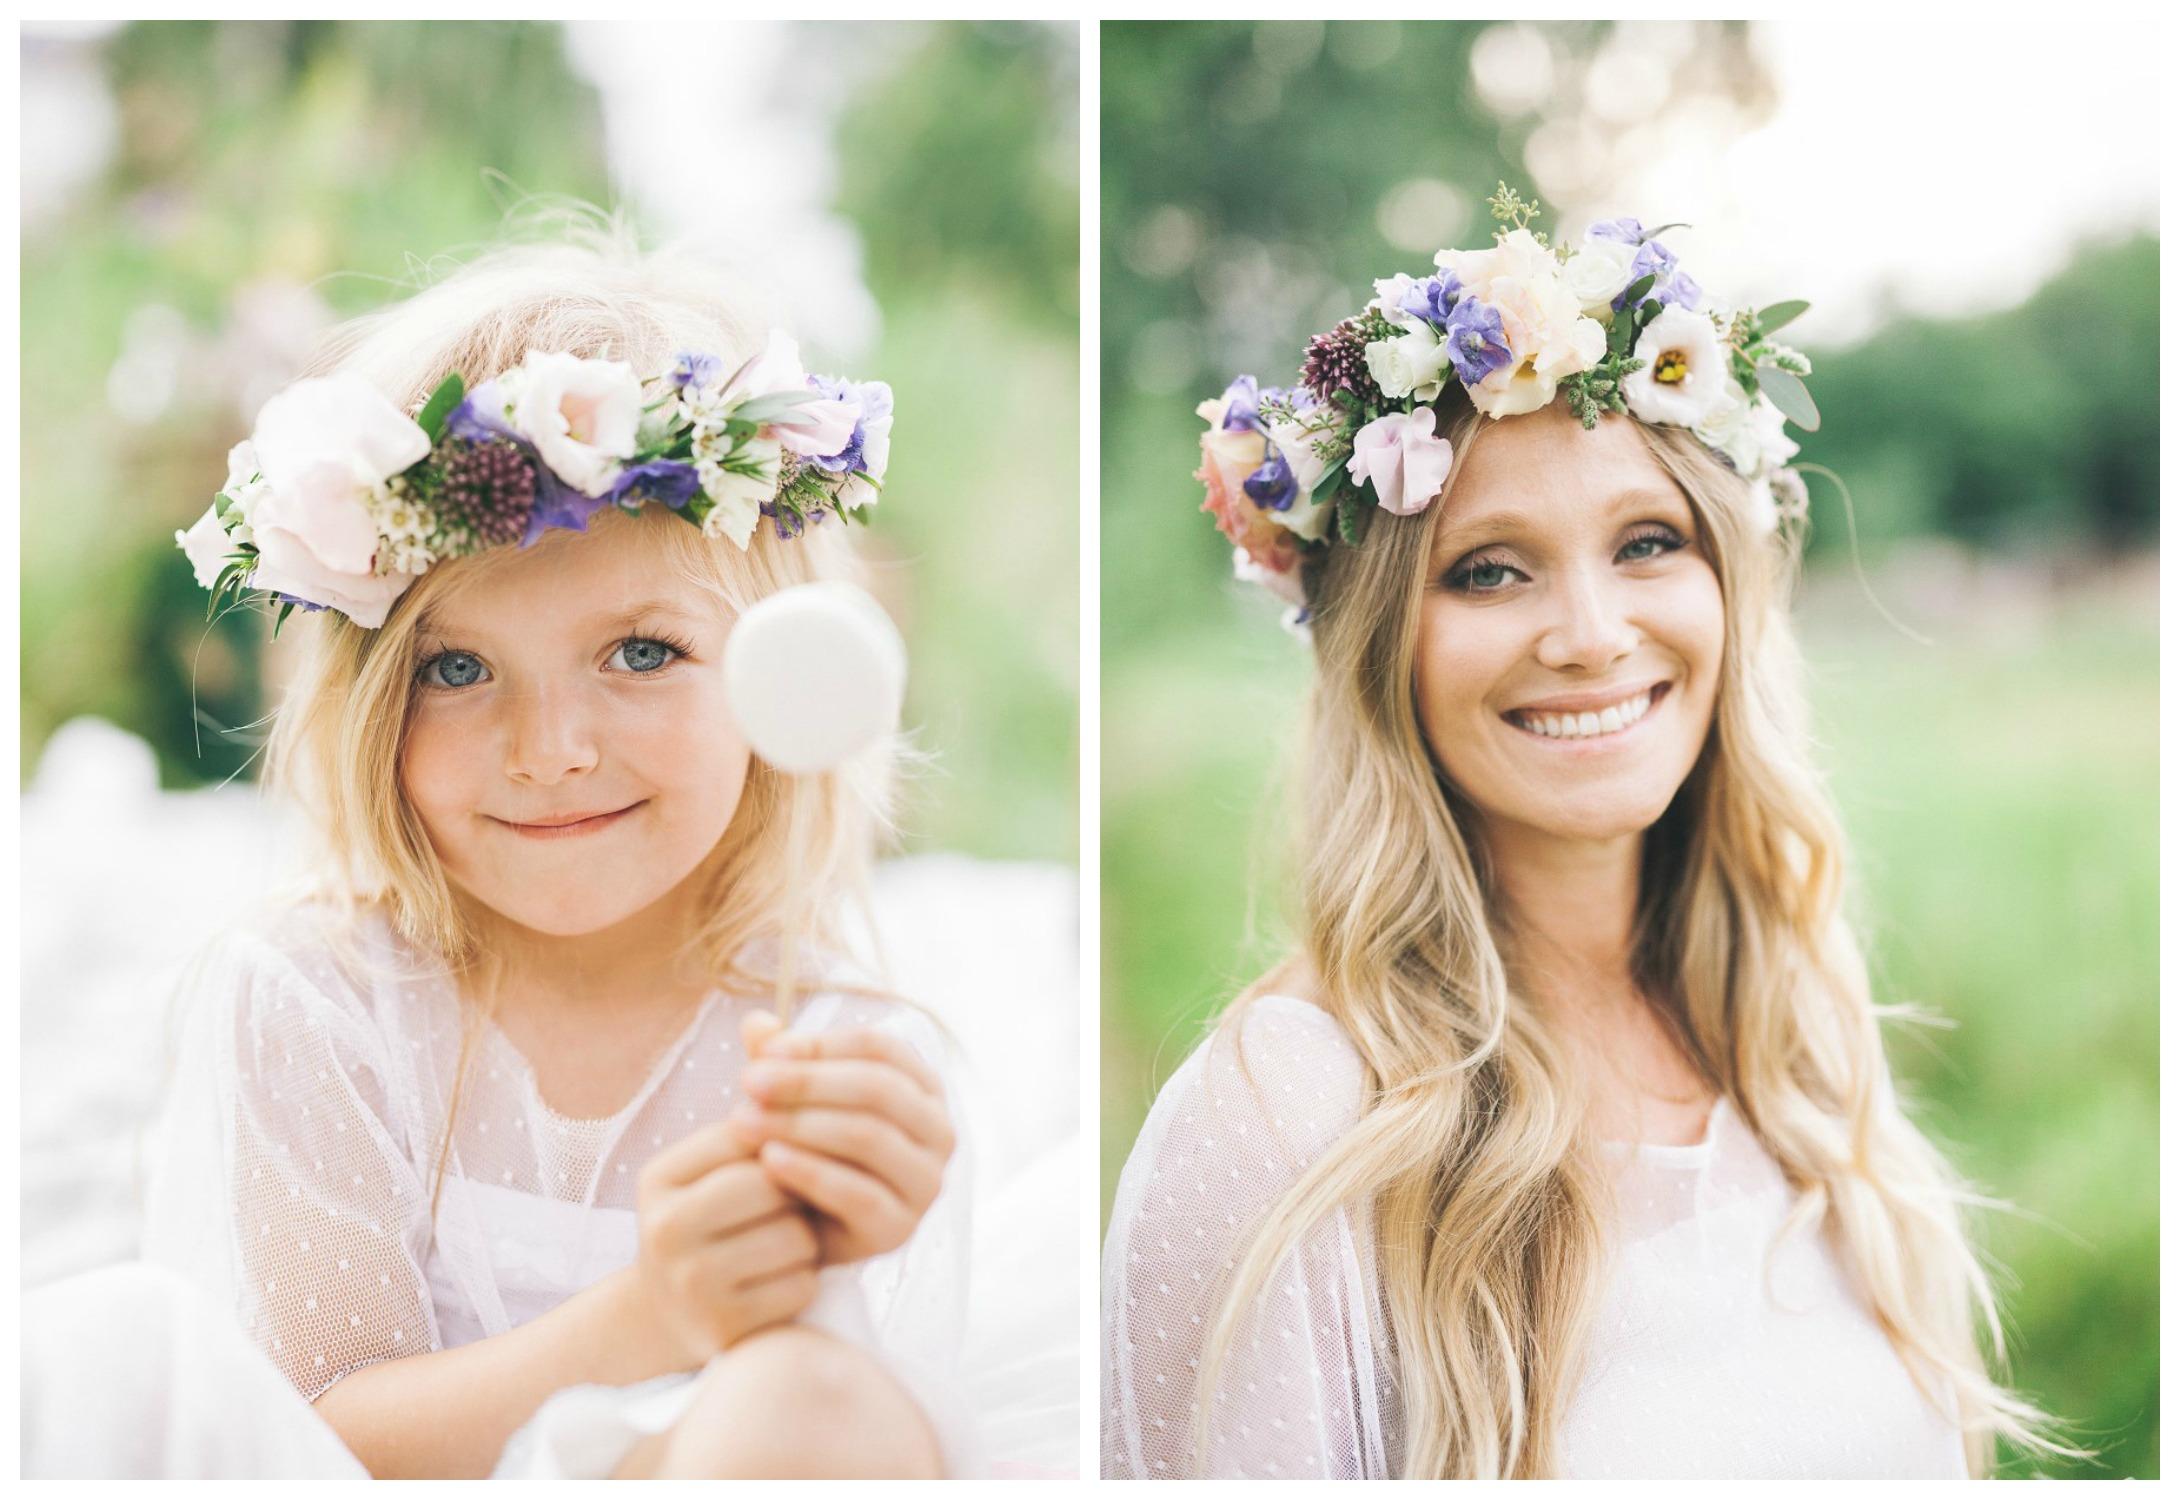 lovetralala_shooting-inspi-kiss-the-bride-festival-2016_07